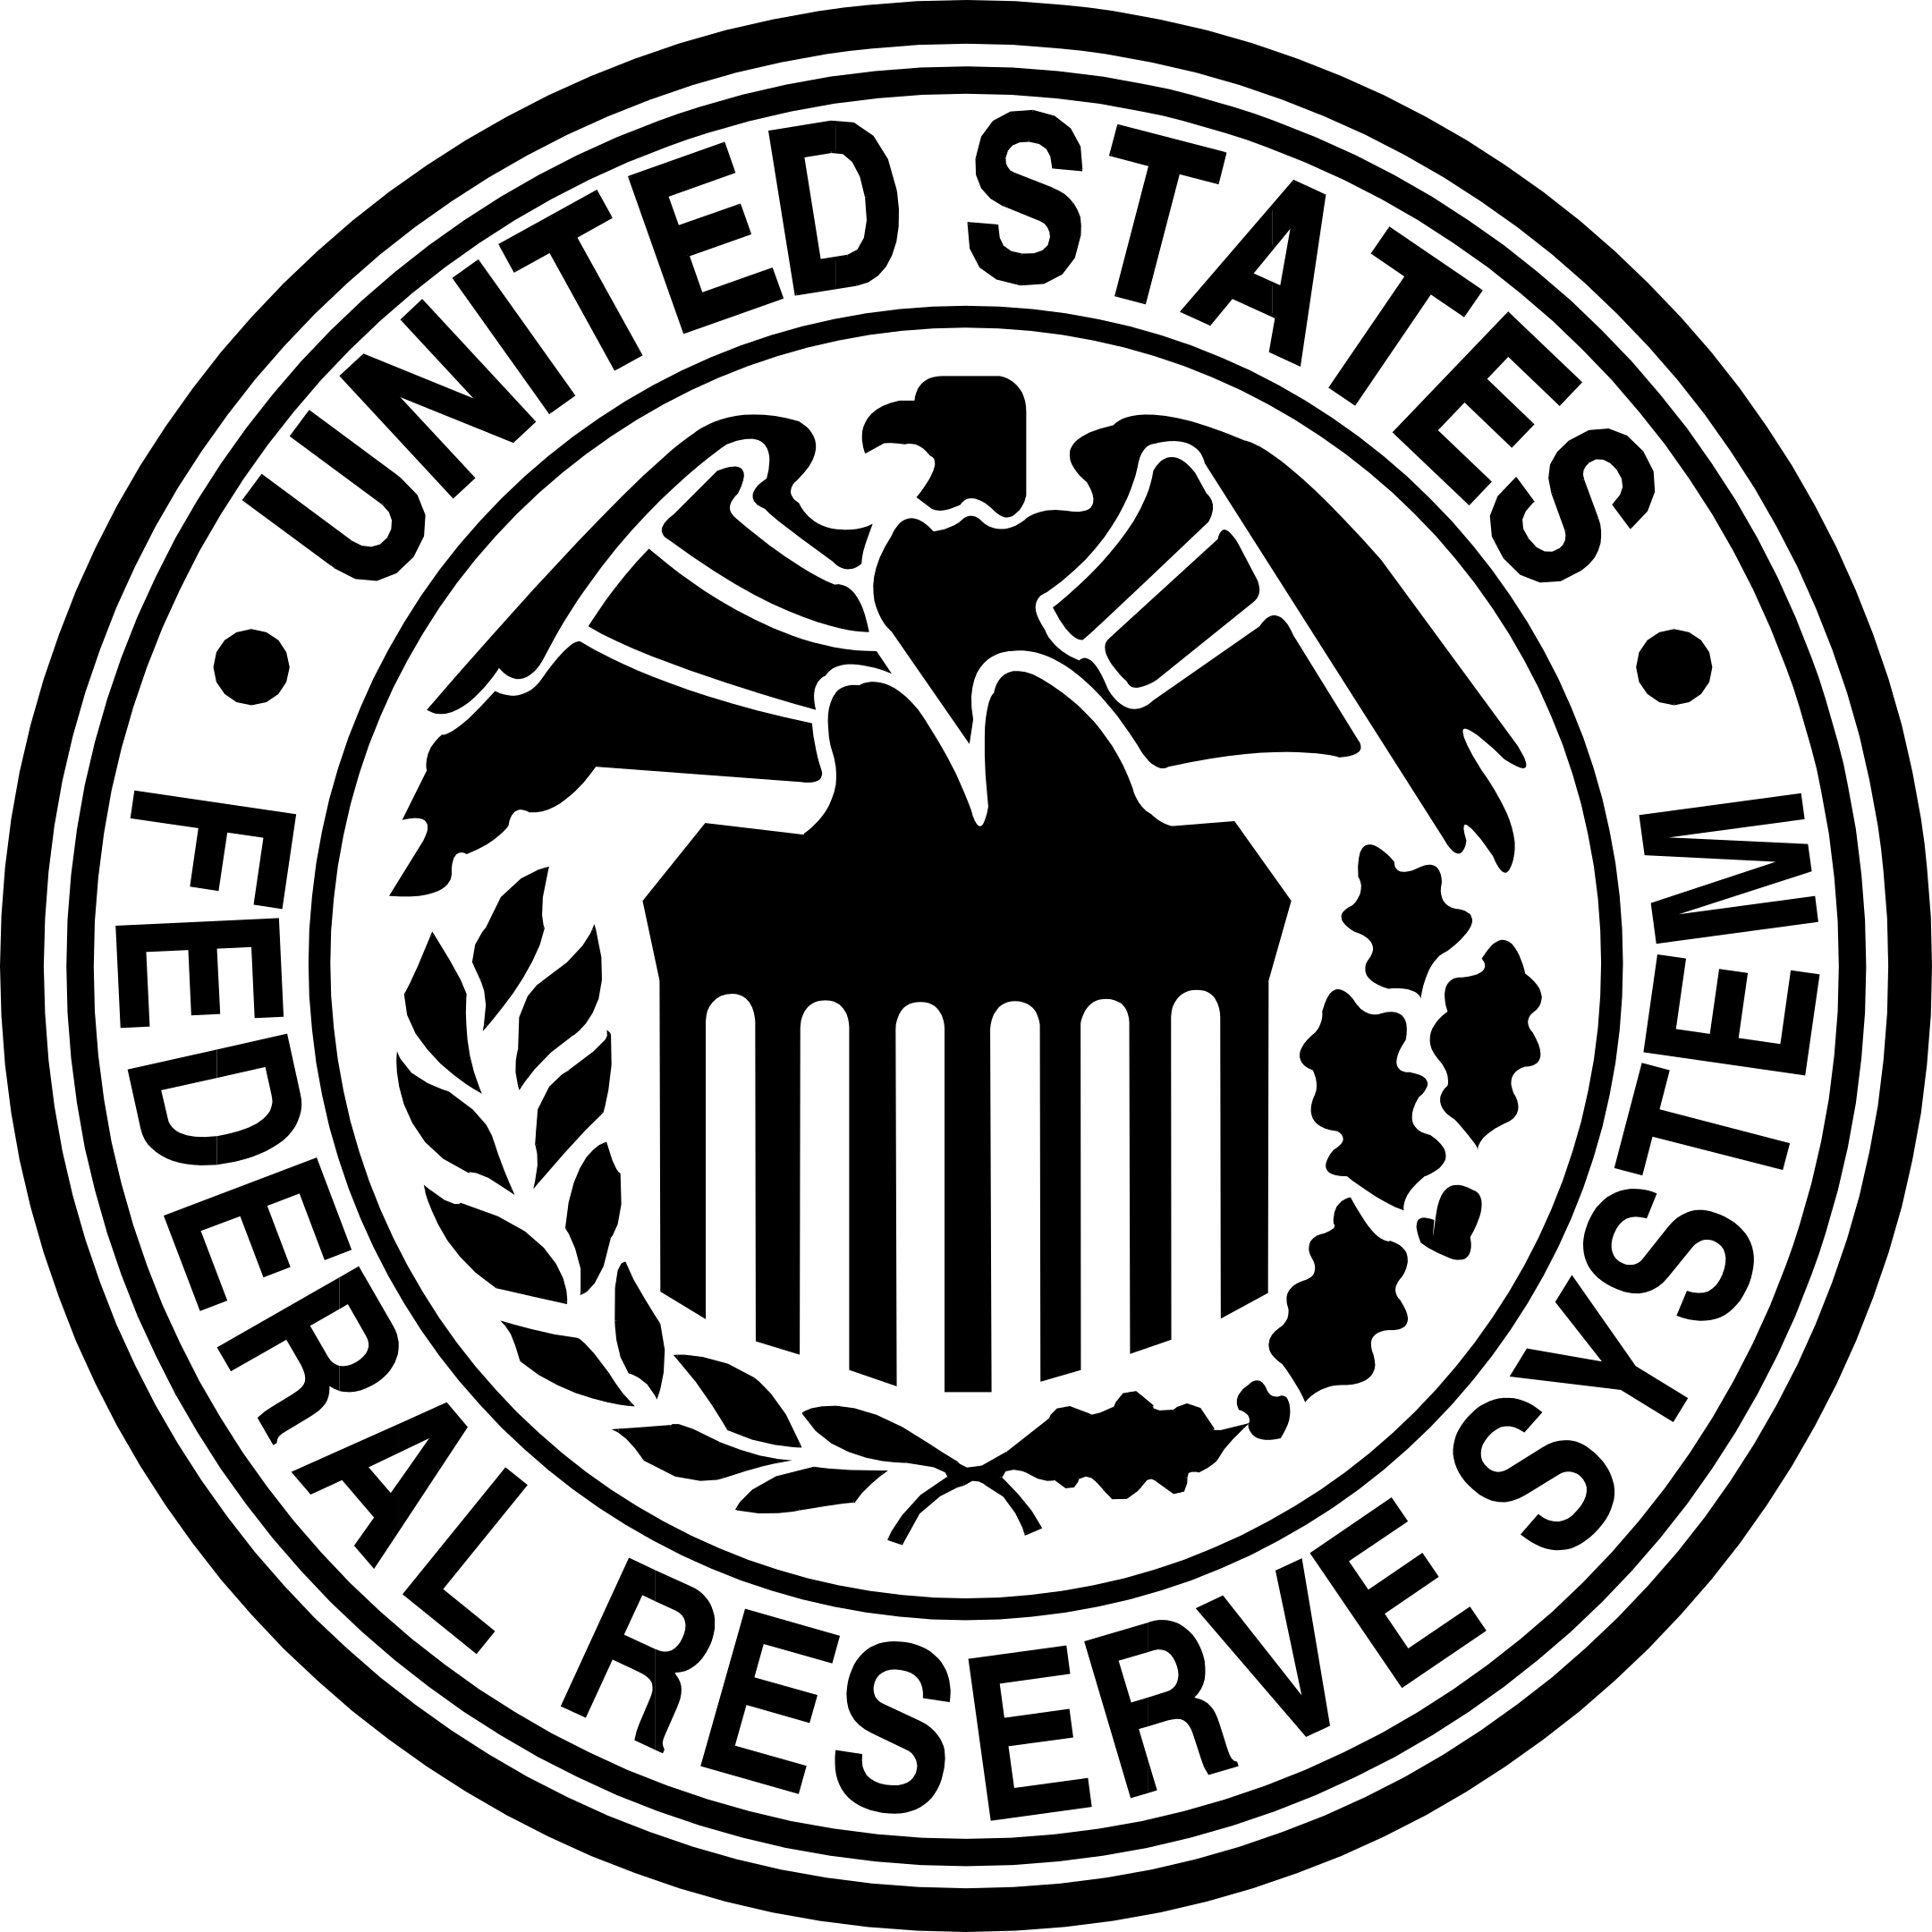 federal reserve logo fed 1 - Federal Reserve Logo - FED Logo